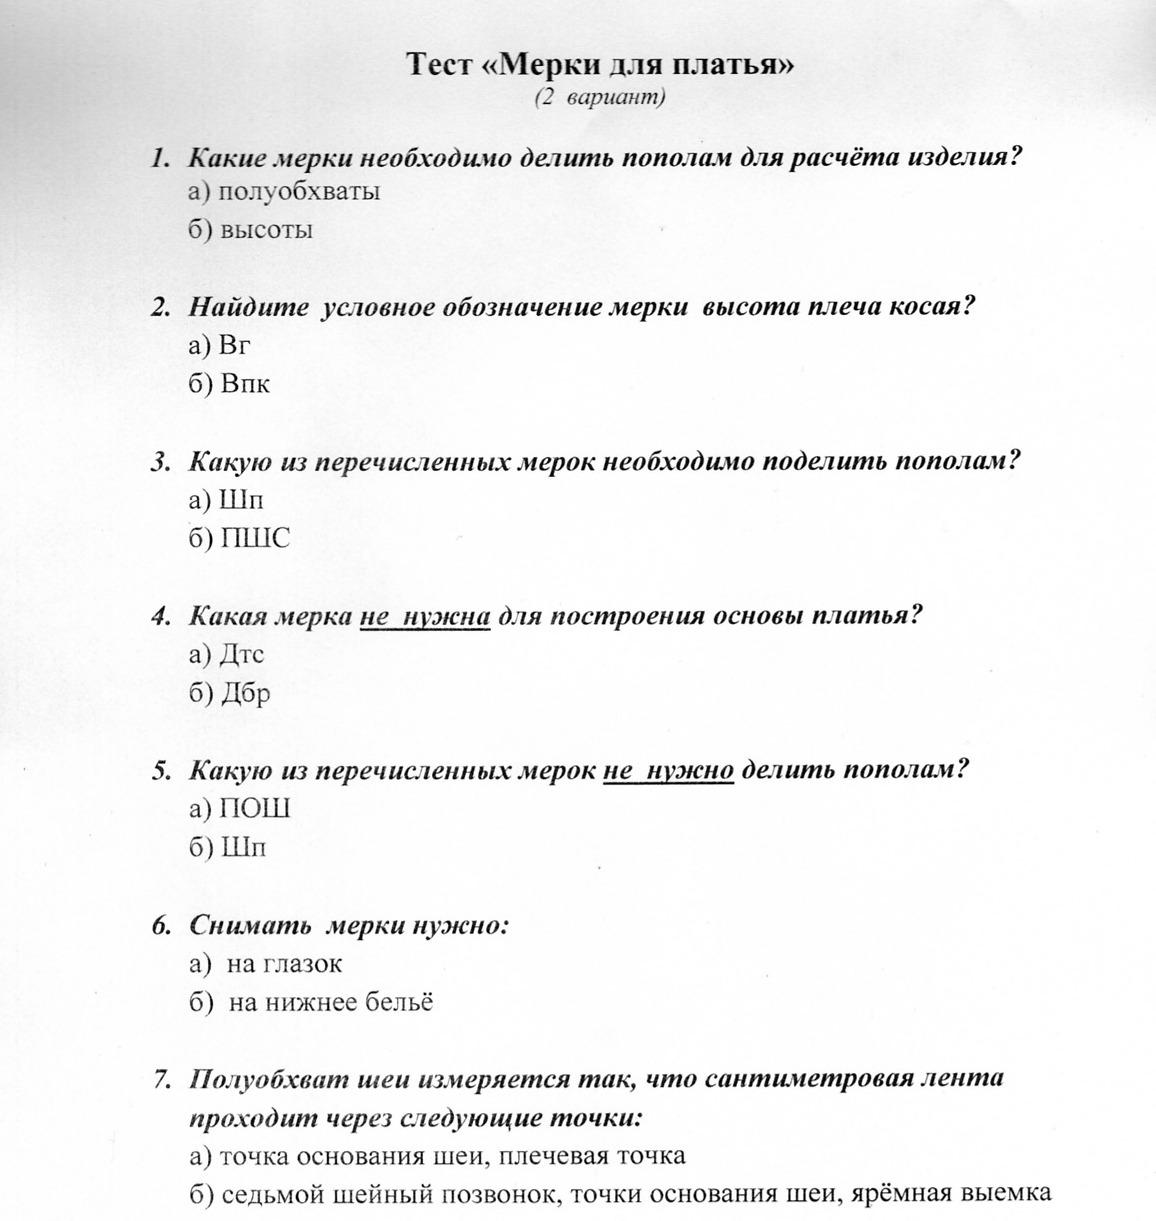 C:\Documents and Settings\Пользователь\Мои документы\Мои рисунки\img372.jpg